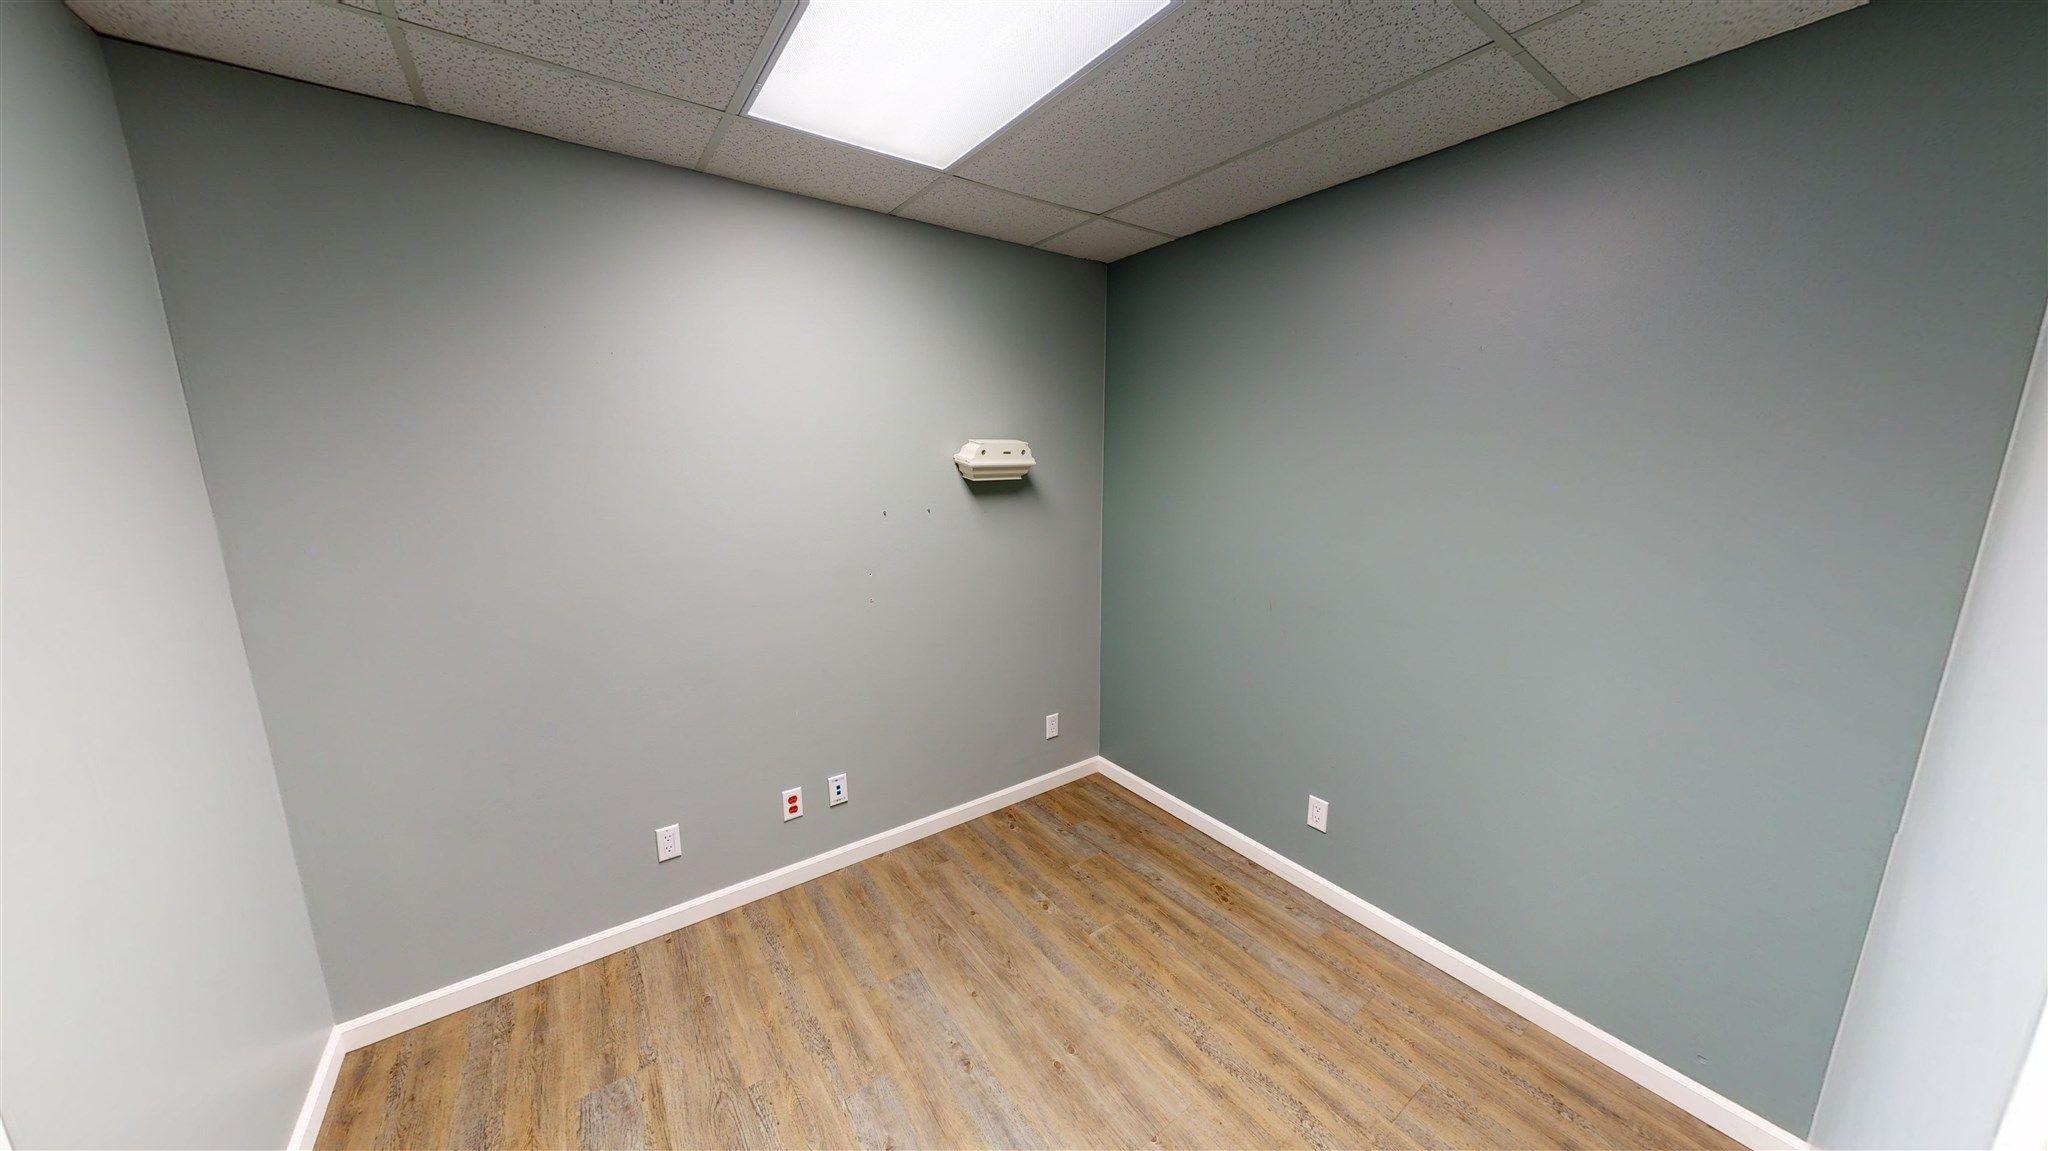 Photo 16: Photos: 10067 100 Avenue in Fort St. John: Fort St. John - City NW Office for sale (Fort St. John (Zone 60))  : MLS®# C8039097